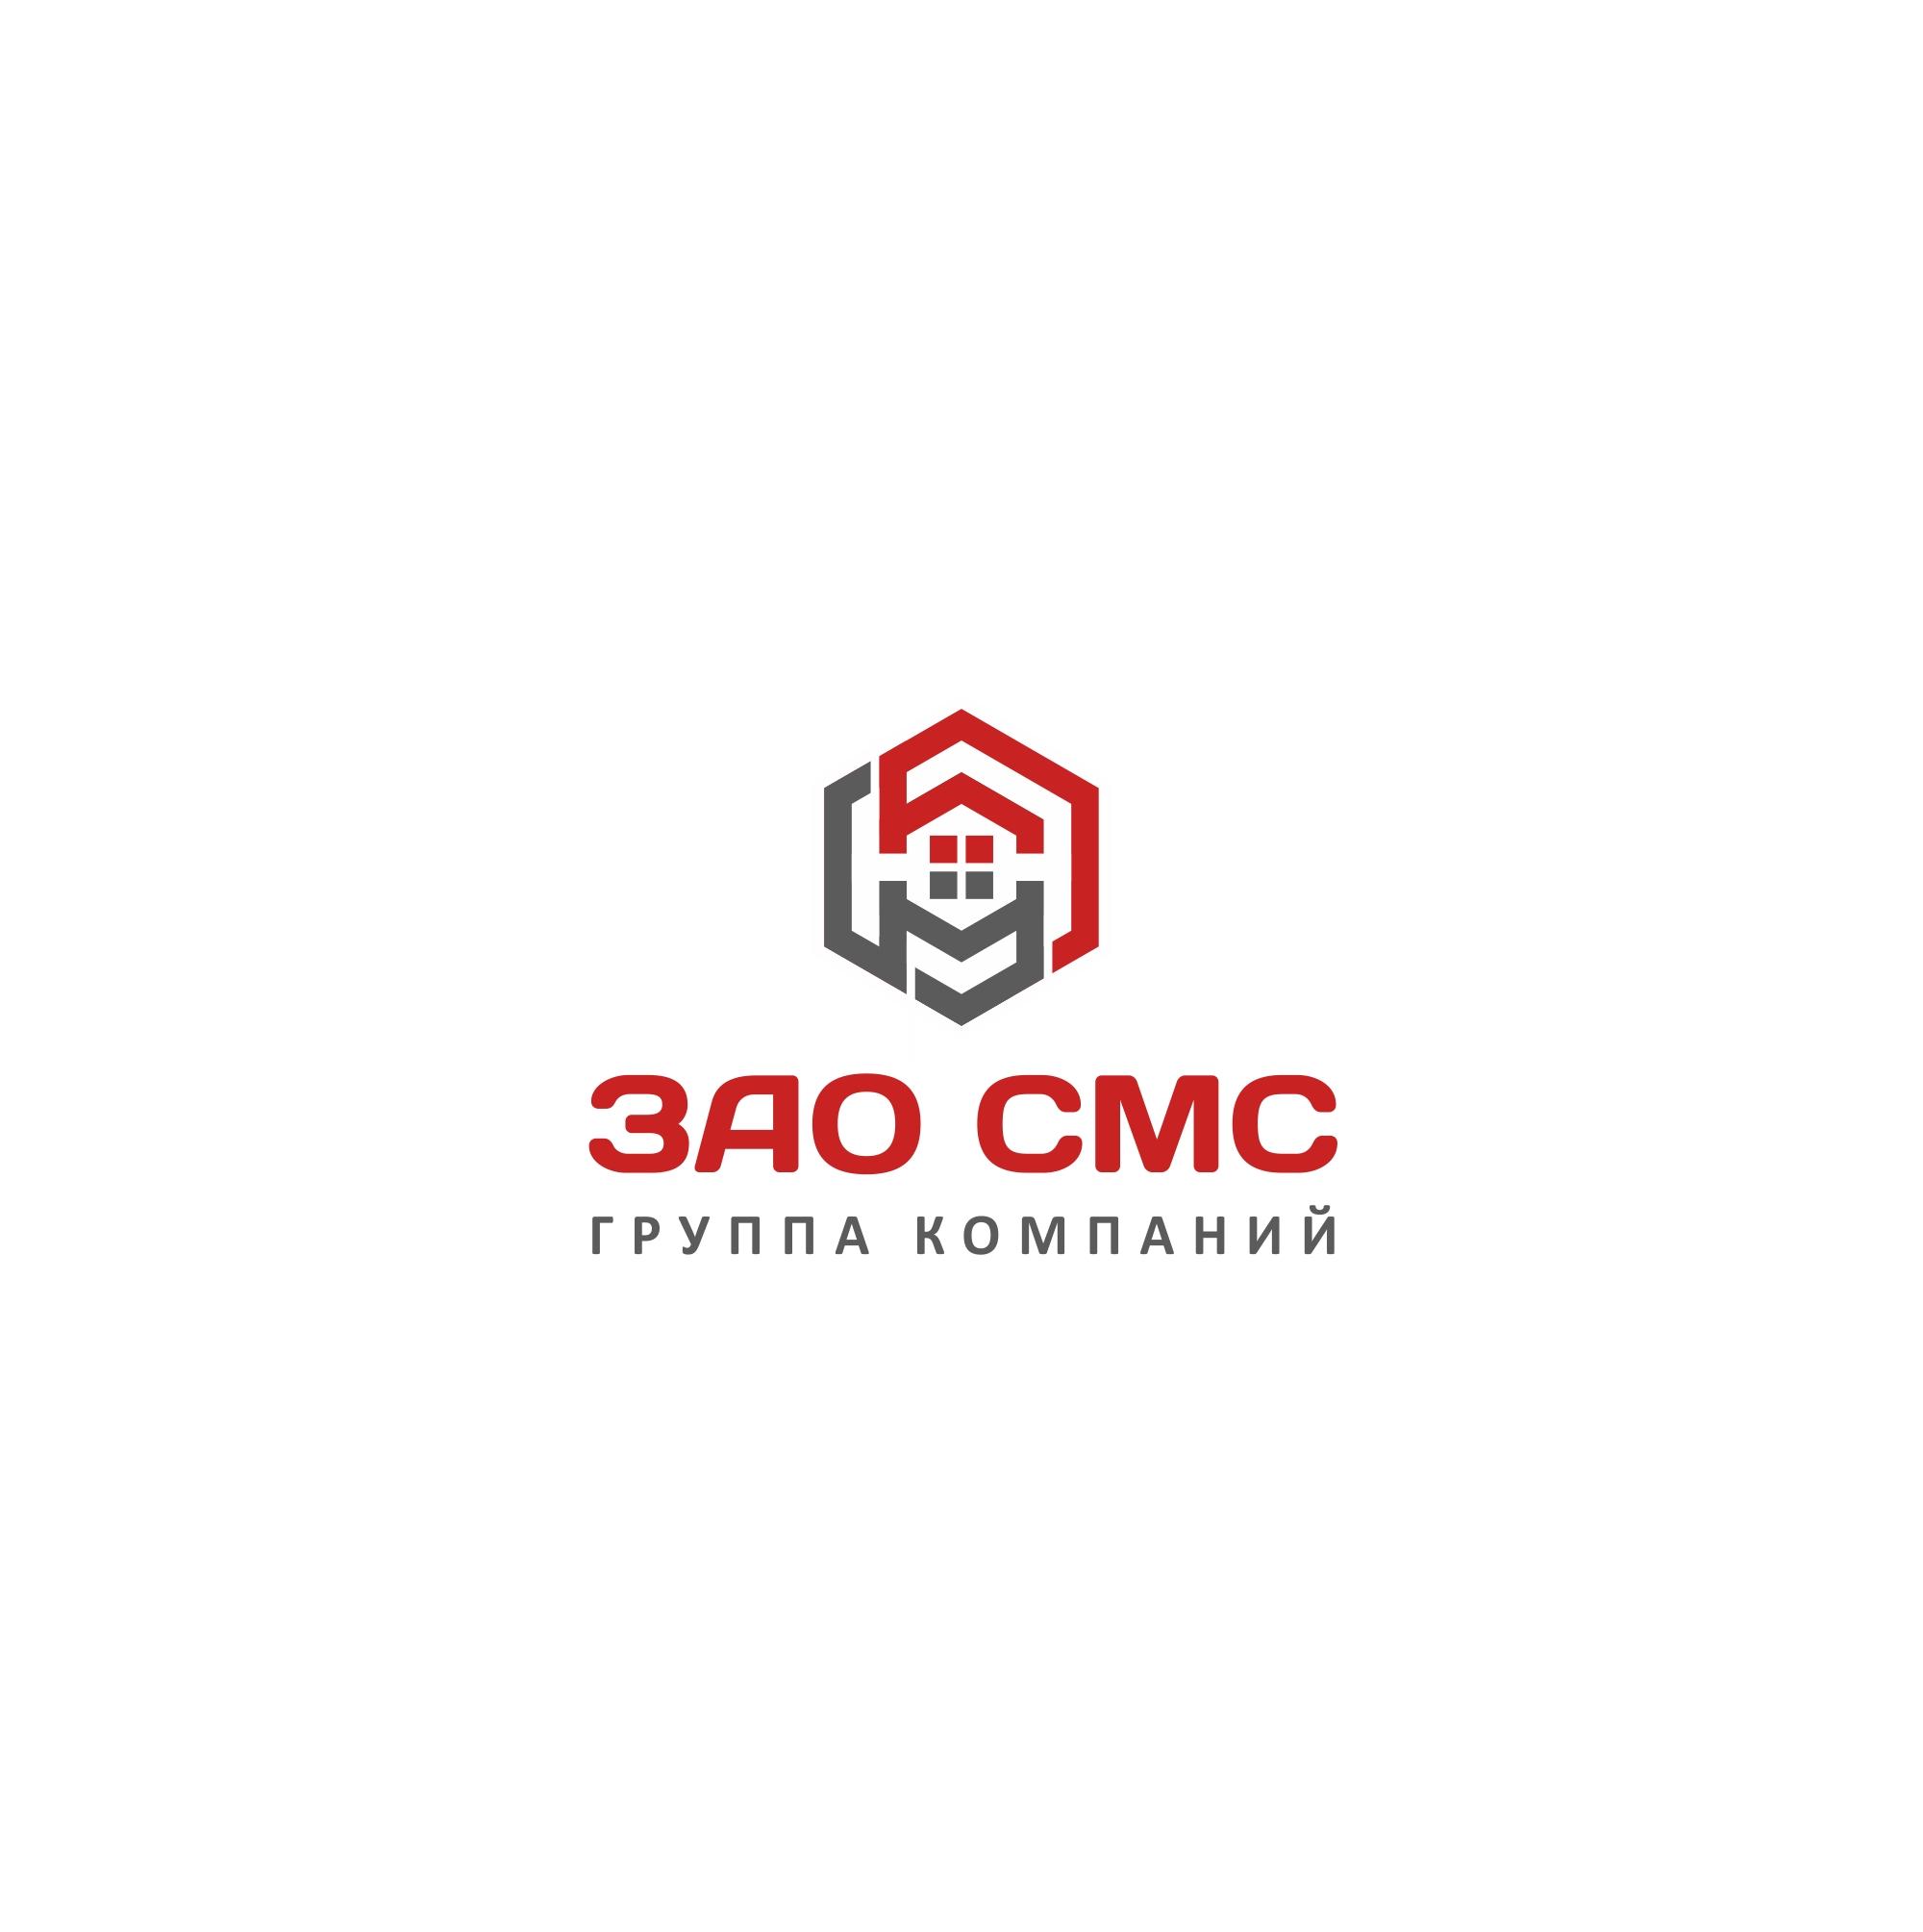 Дизайнер для разработки Логотипа для организации !СРОЧНО! фото f_1345a26edd43c090.jpg